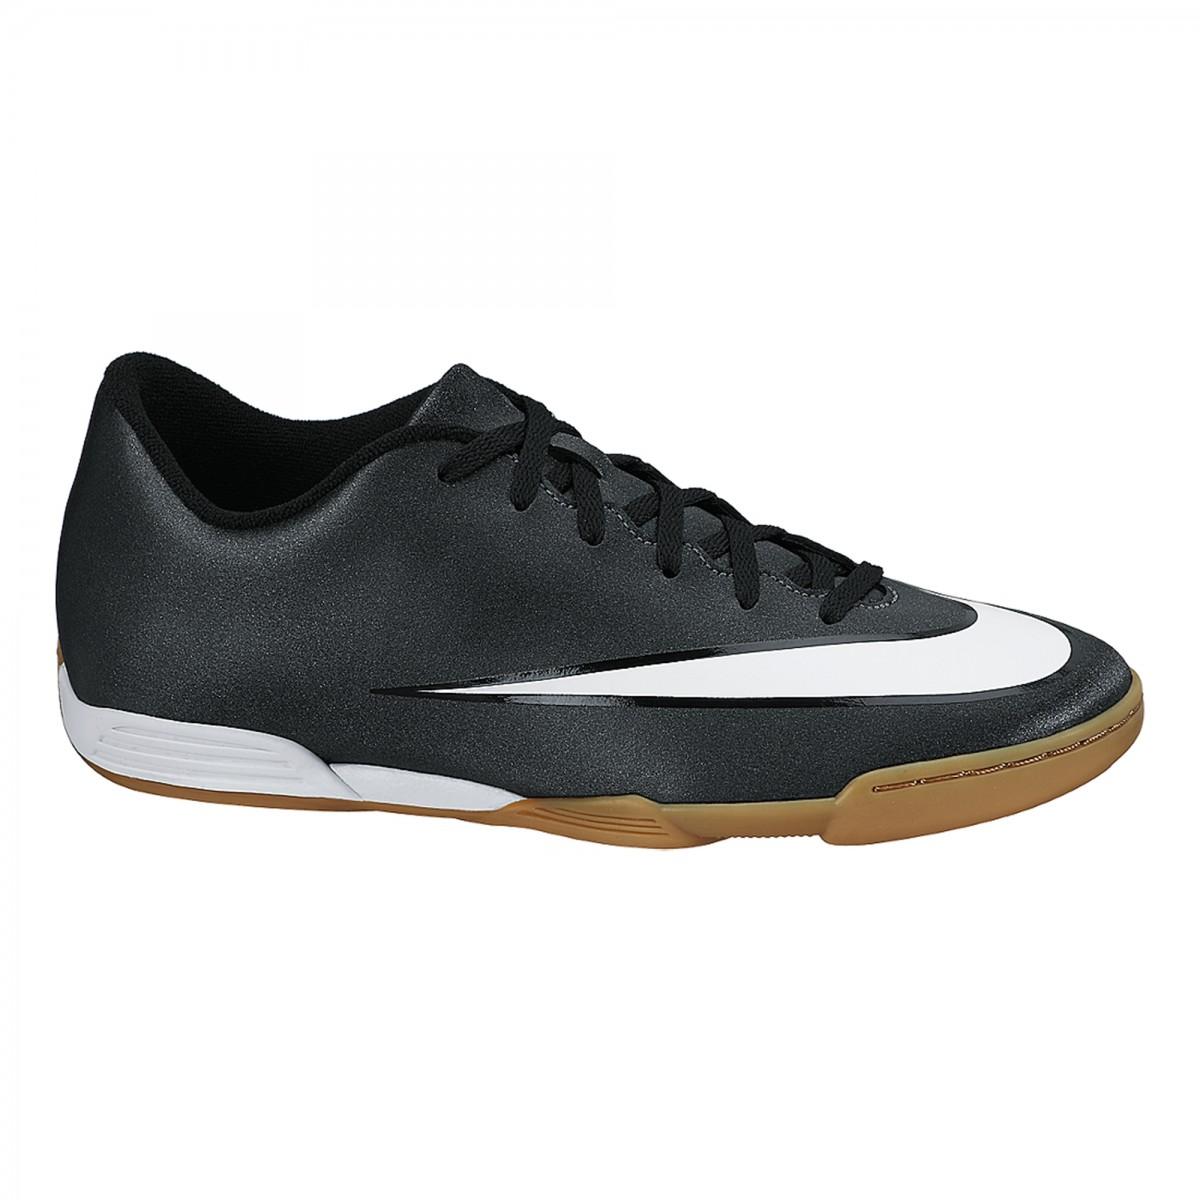 8550d62c722 Bizz Store - Chuteira Futsal Nike Mercurial Vortex II Cristiano Ronaldo